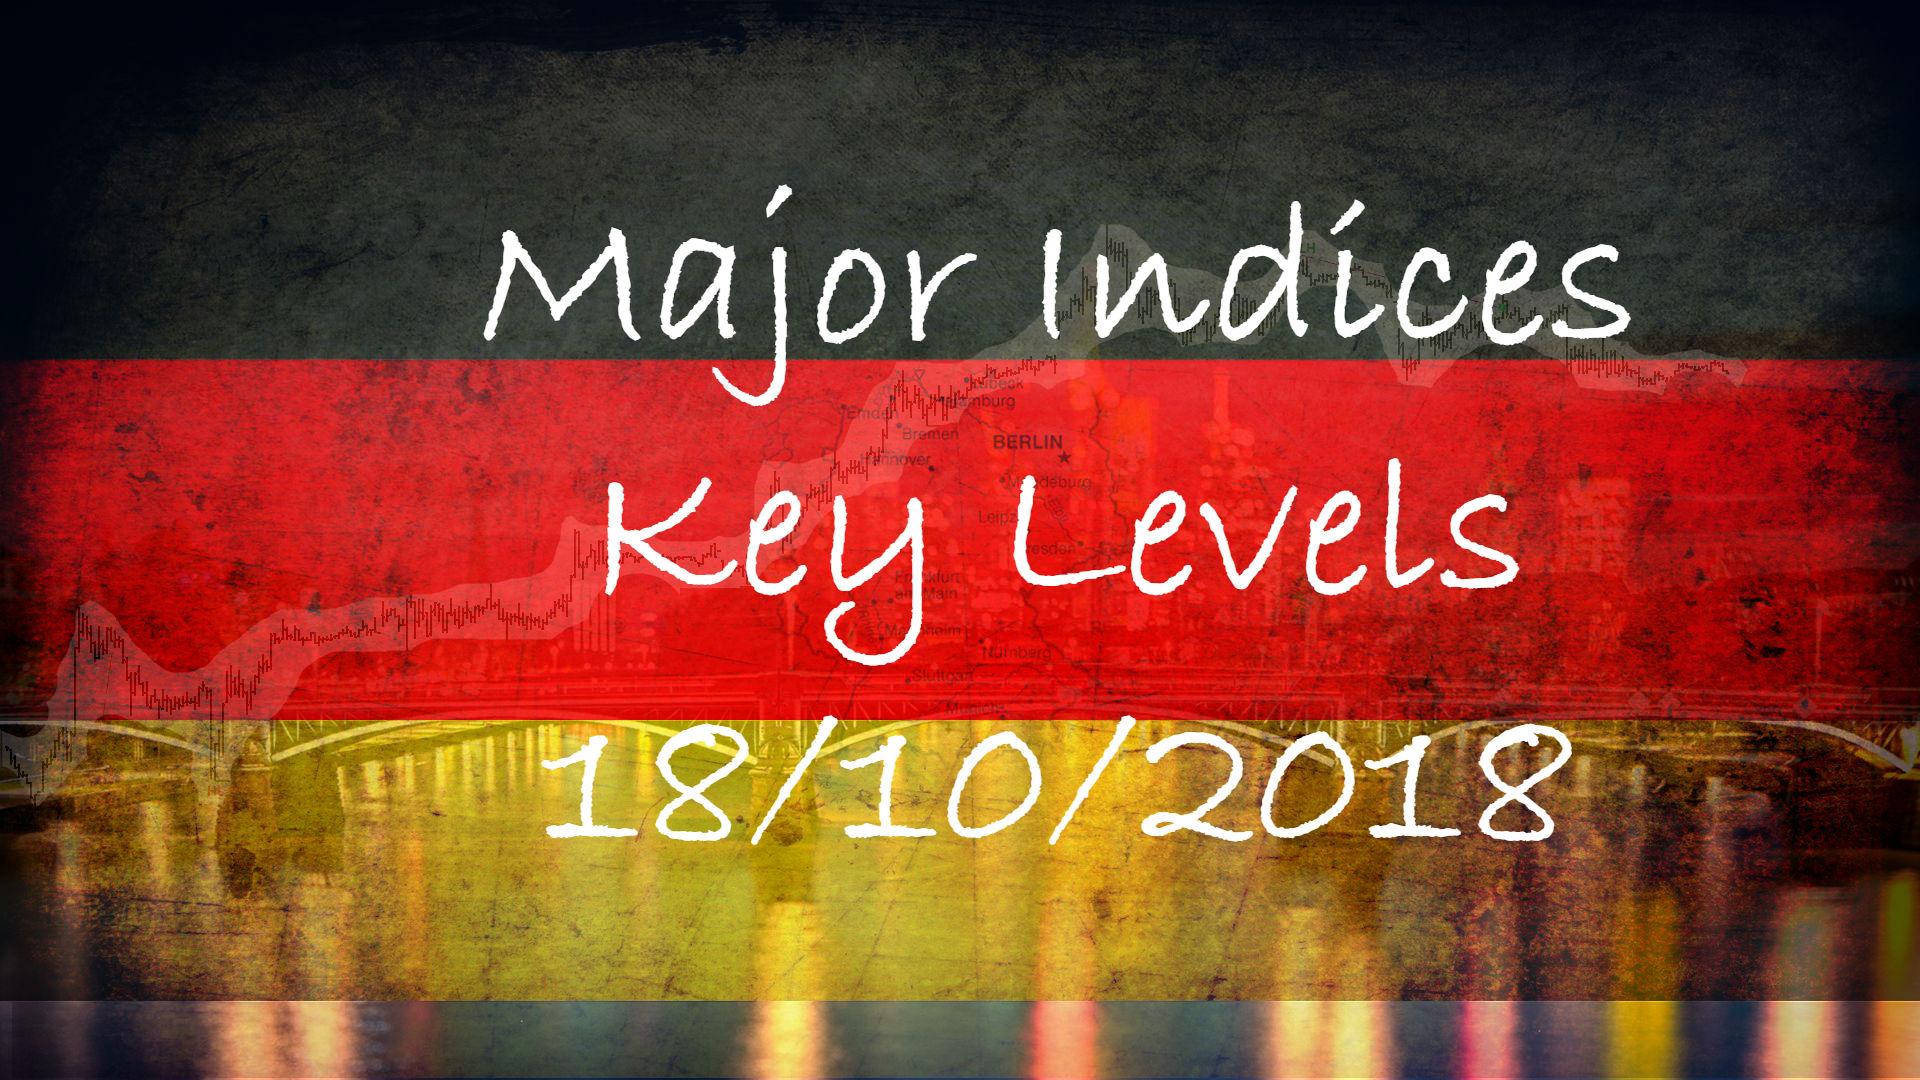 18-10-2018 Technical Analysis